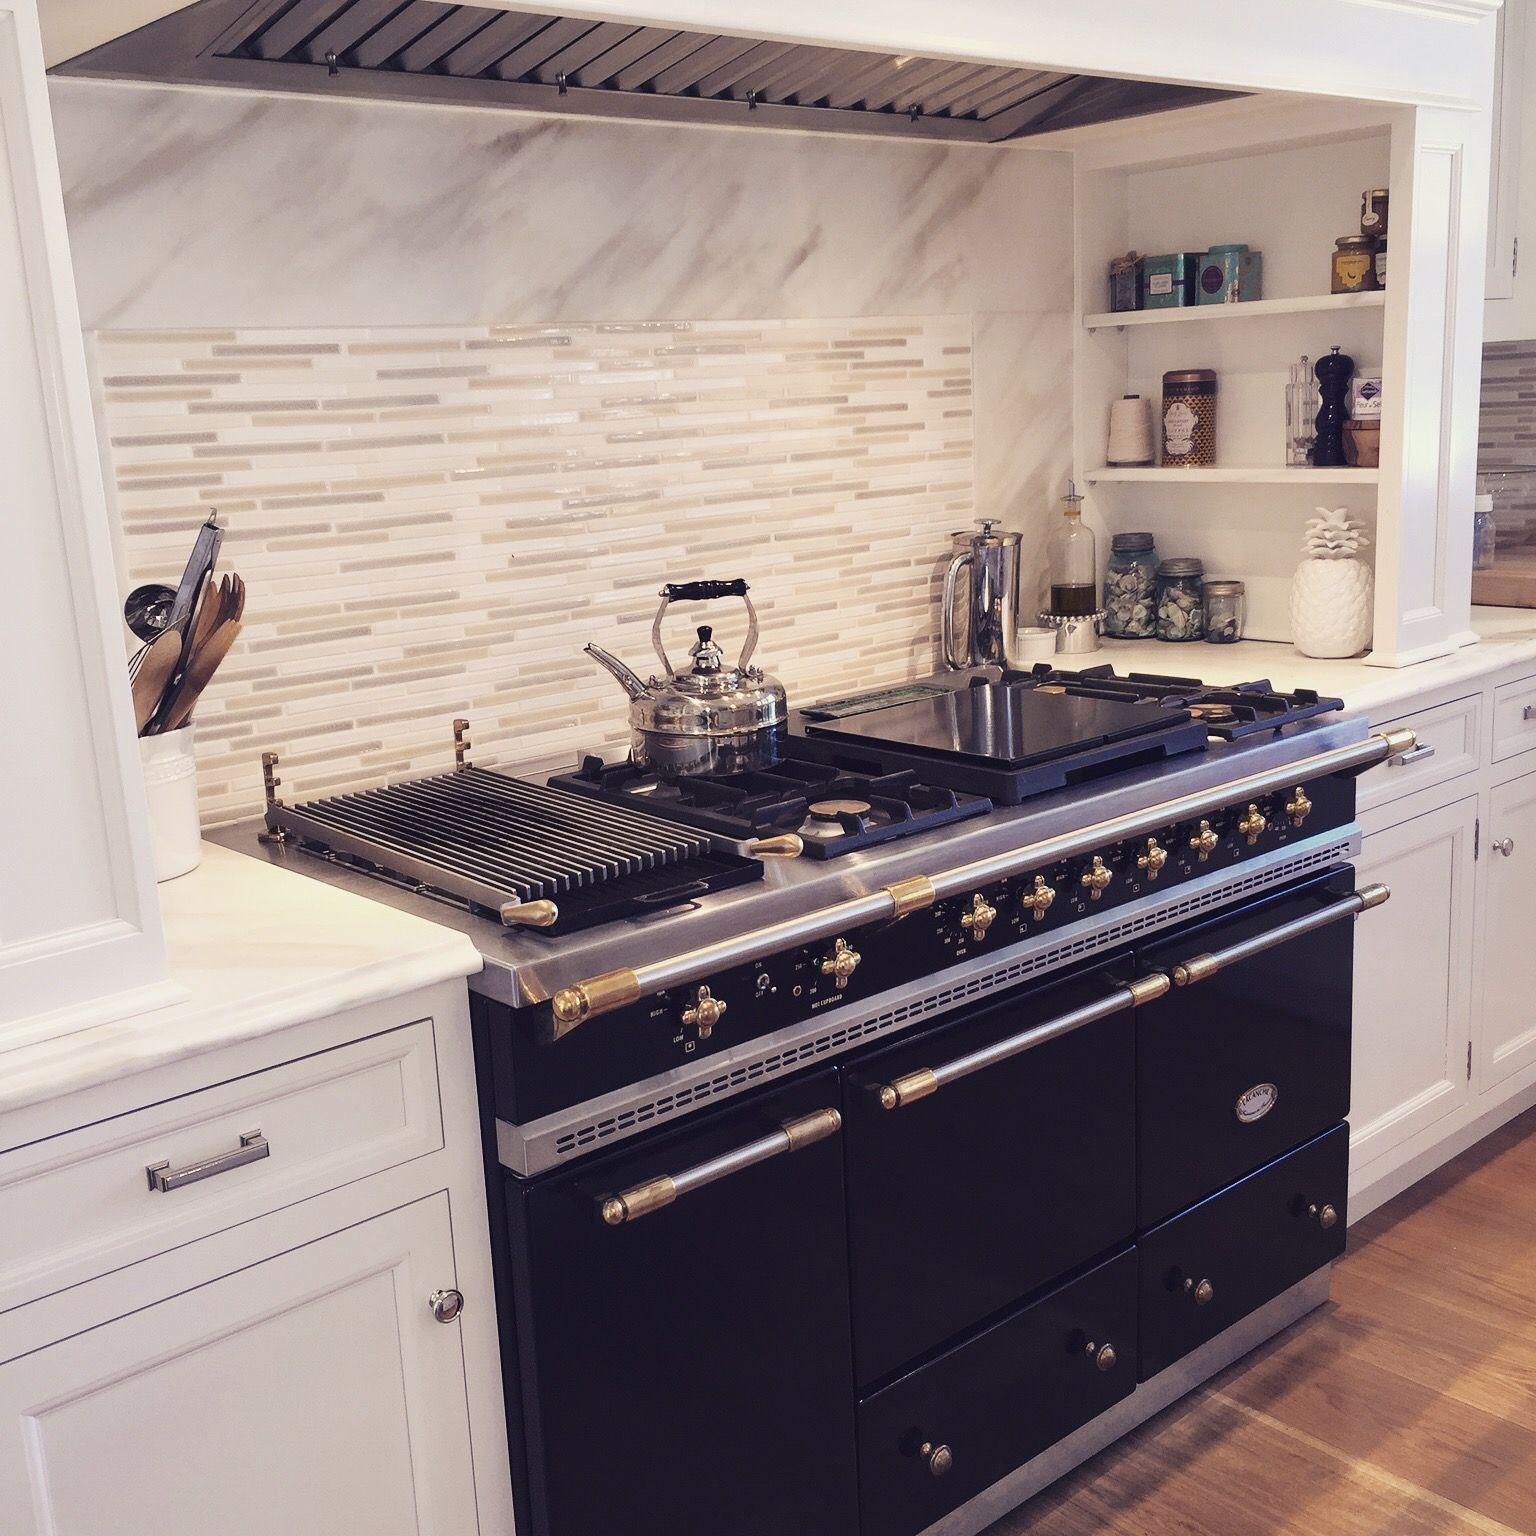 Surprising Ideas Faux Copper Backsplash Backsplash With White Cabinets Herringbone Pattern Tin Kitchen Backsplash Tile Designs Farmhouse Backsplash Backsplash